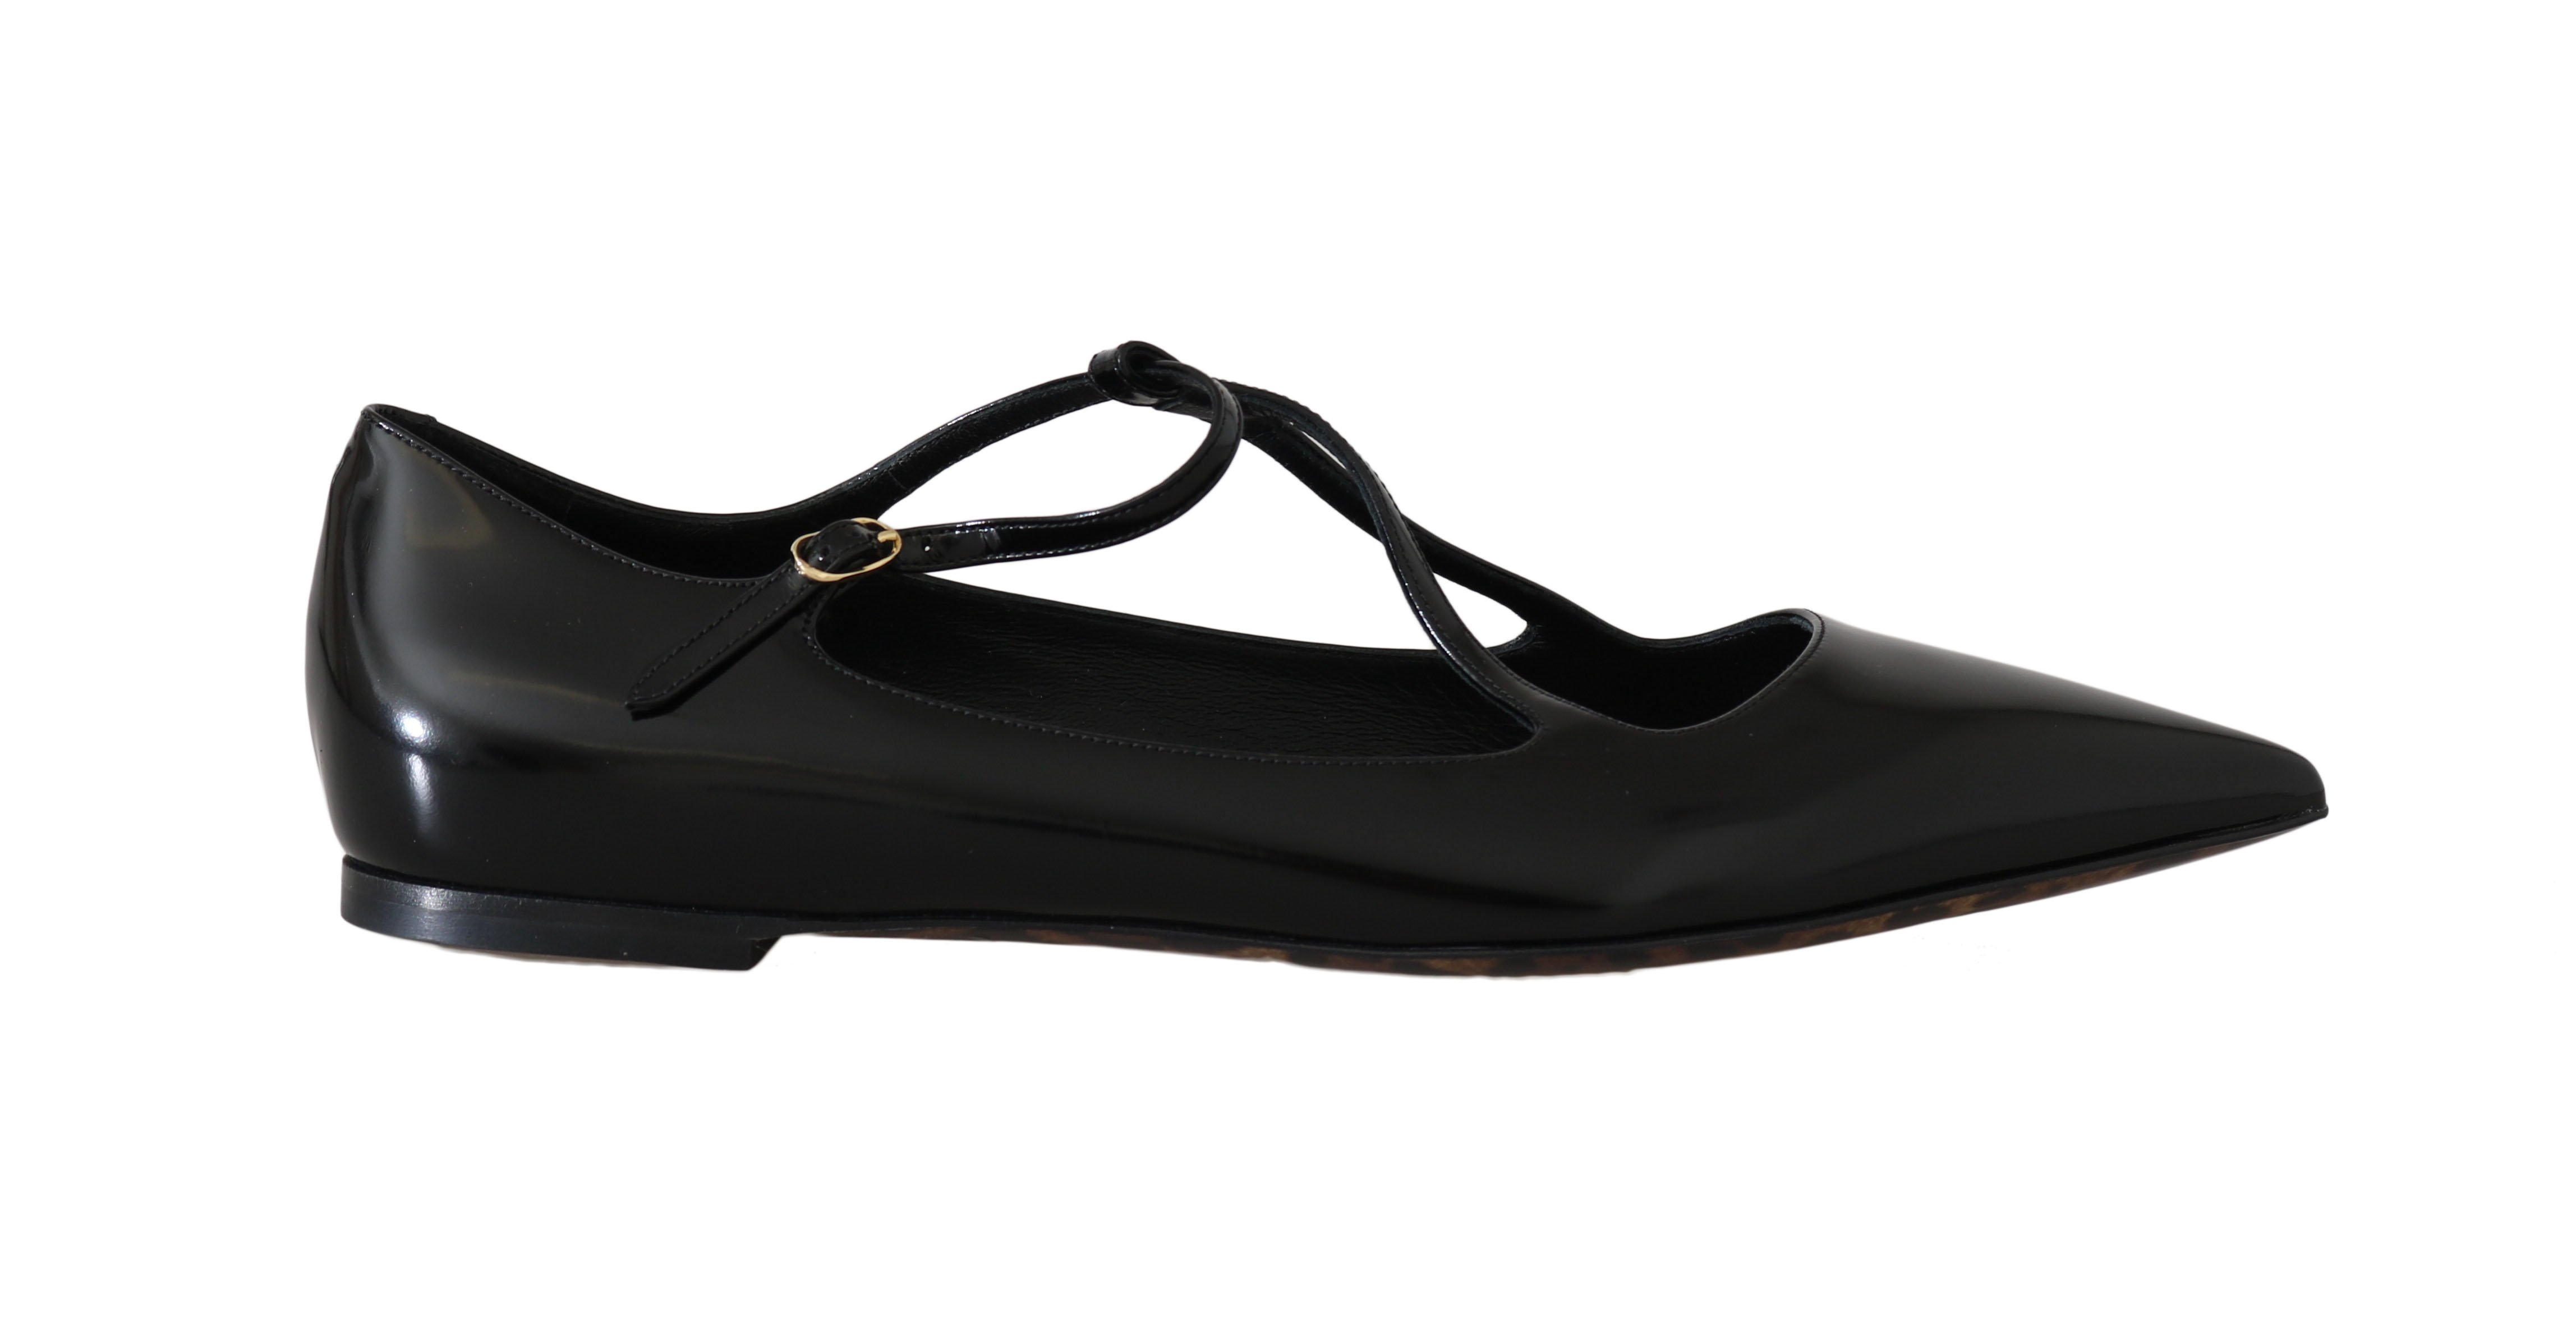 Dolce & Gabbana Women's Leather Leopard Ballet Flats Black LA5625 - EU36.5/US6